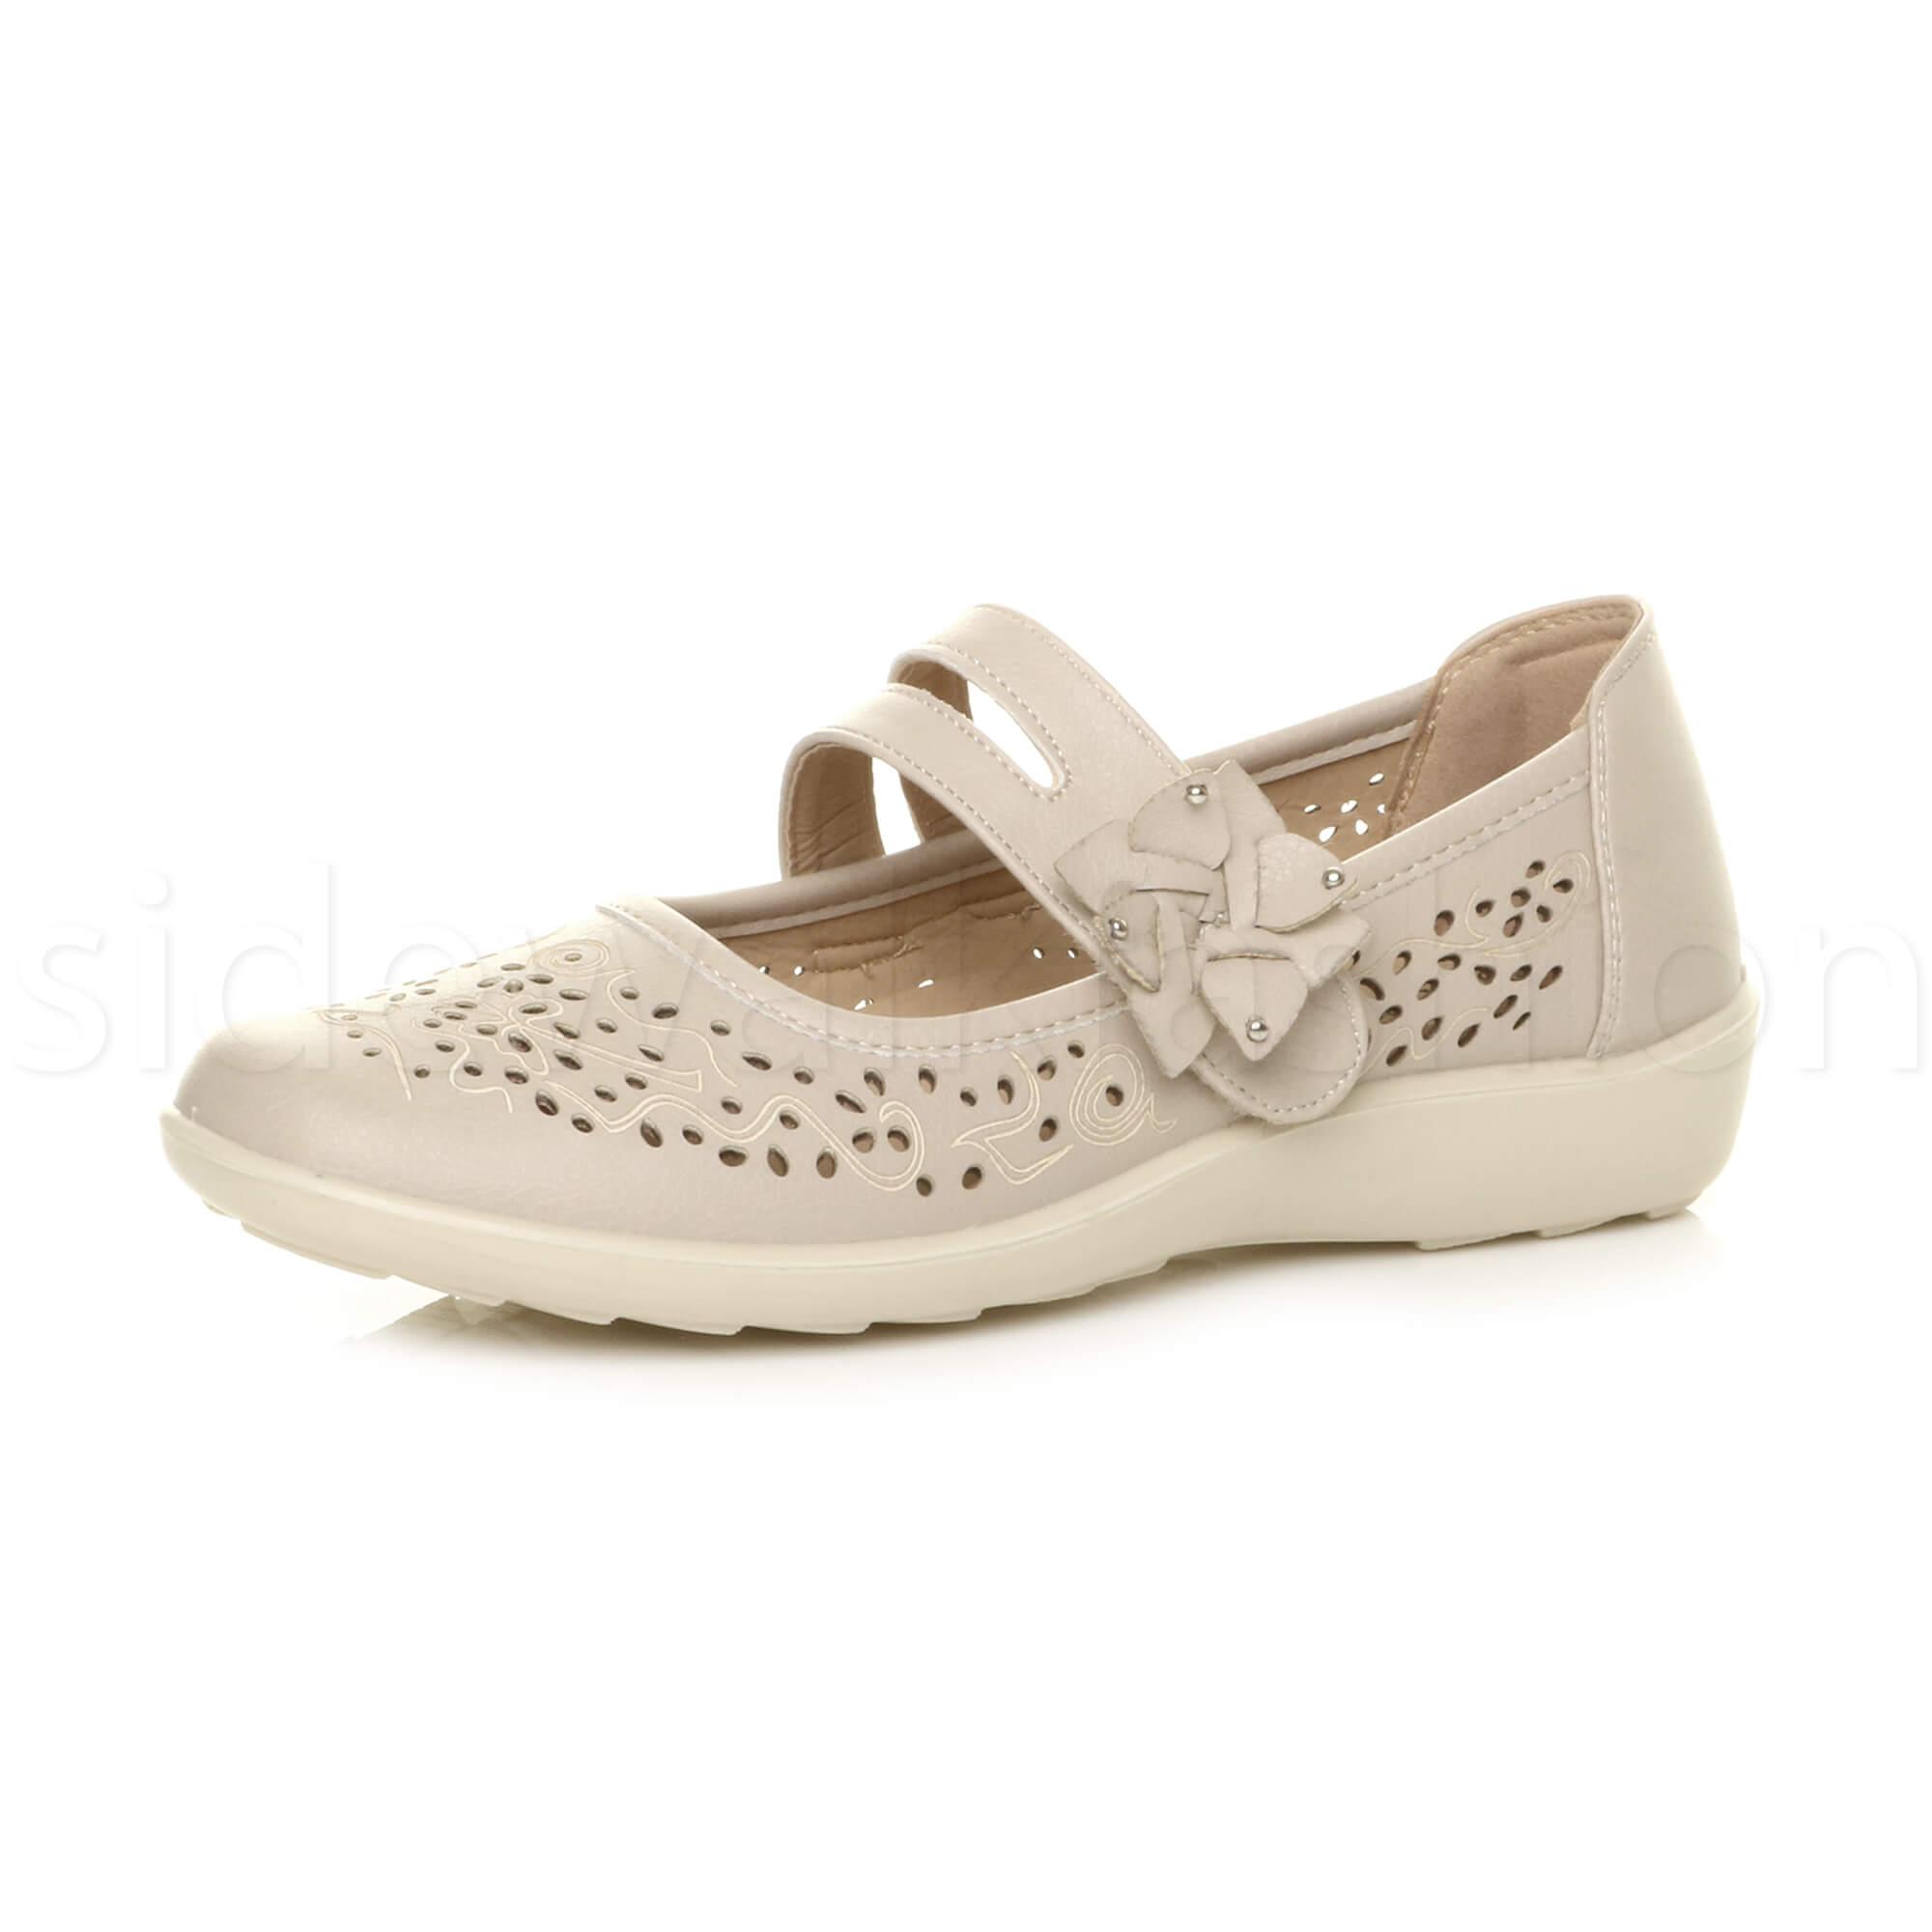 Mujer ladies flat grip cushioned mary jane smart Talla work summer comfort Zapatos Talla smart dc4948